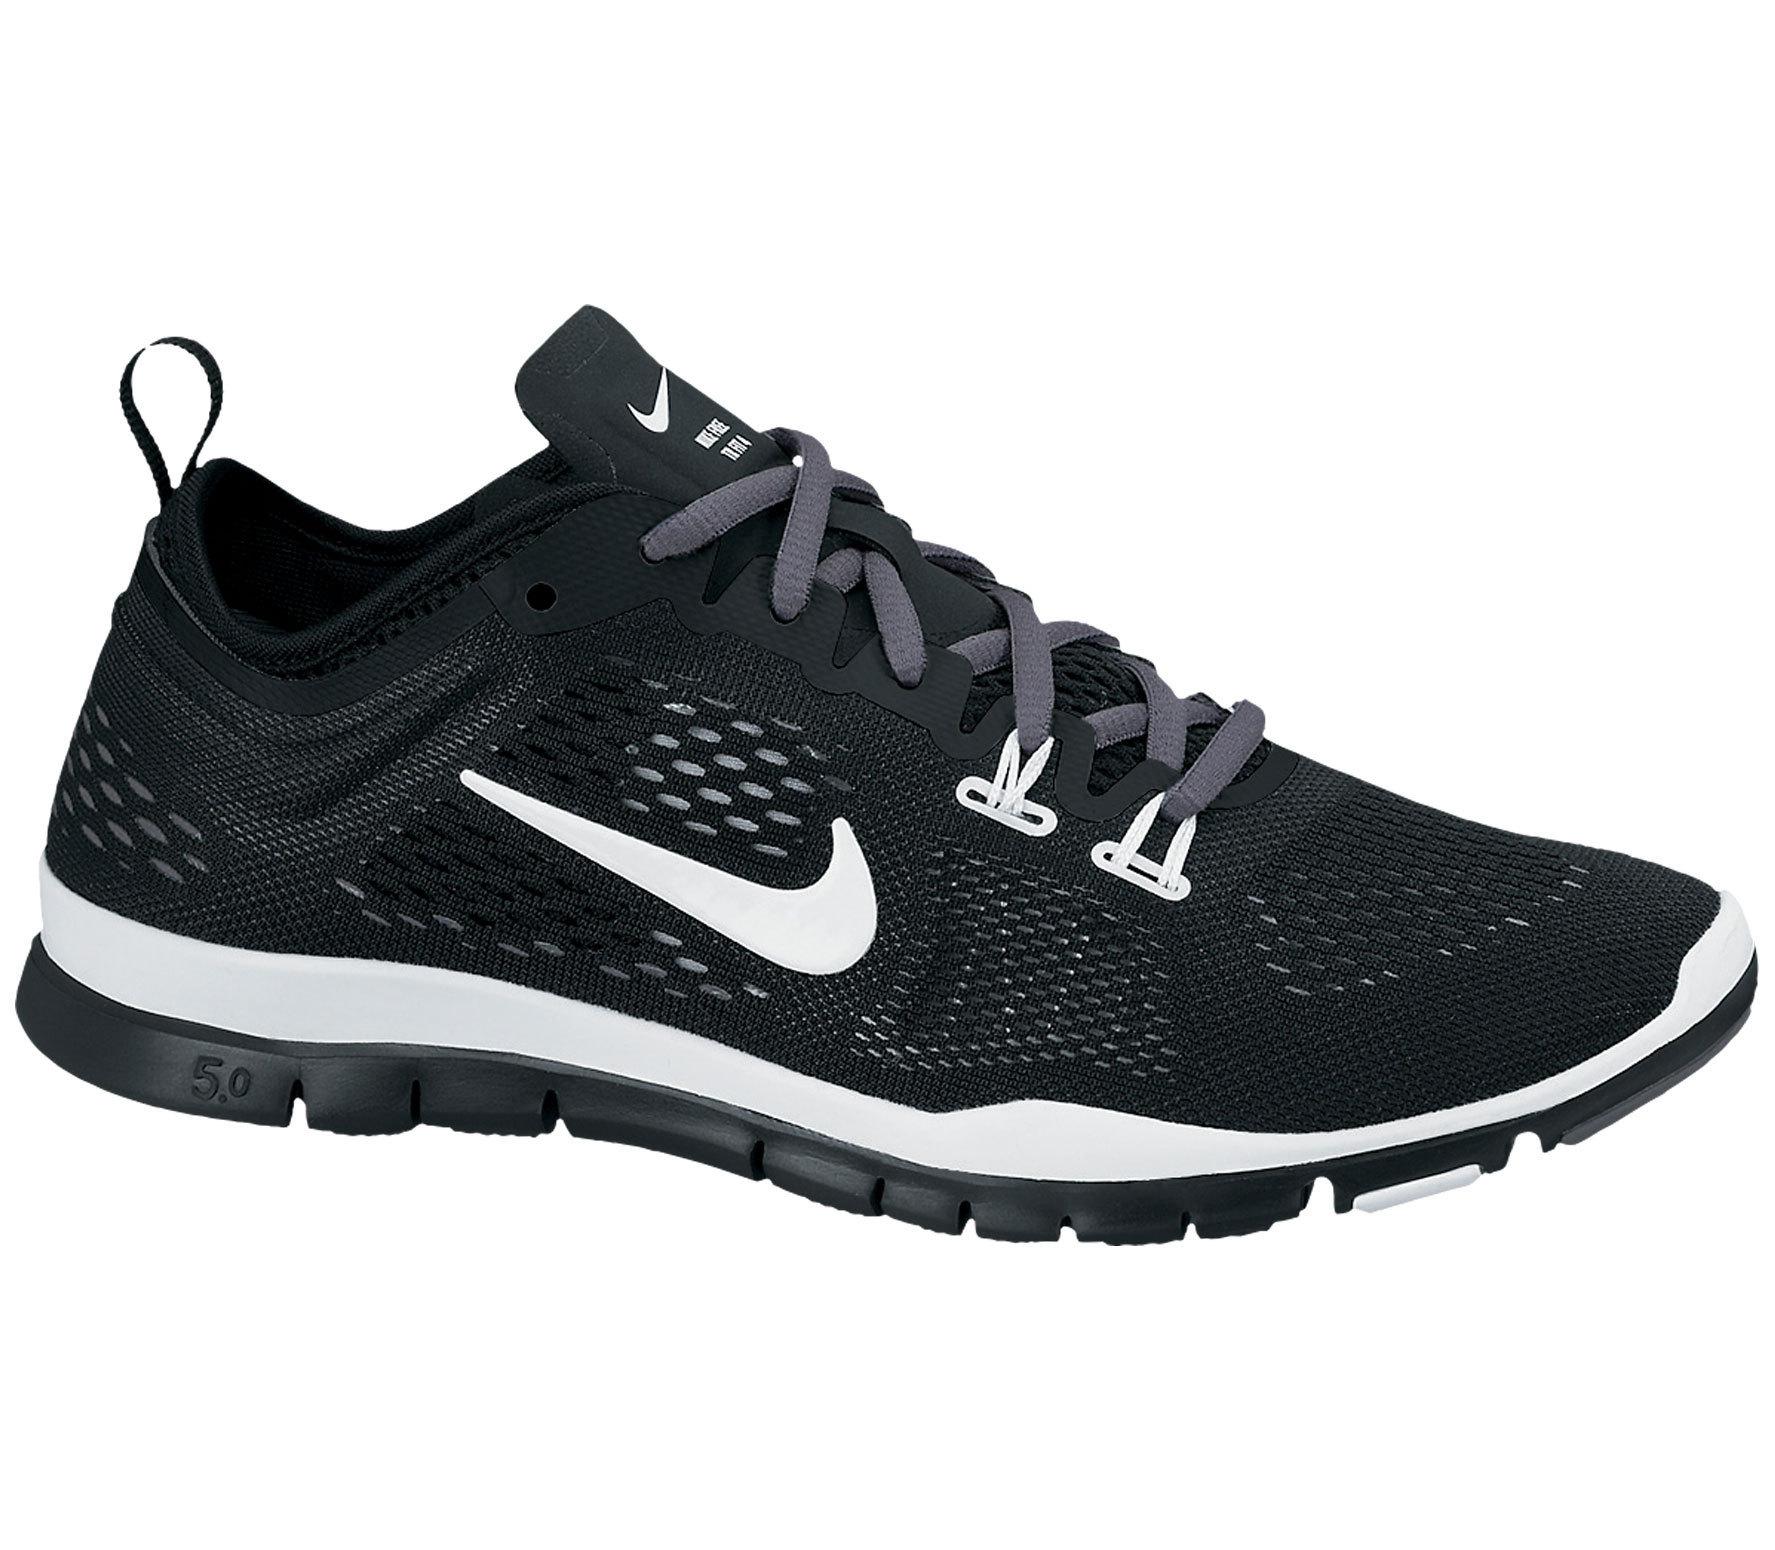 wholesale dealer 3f266 08f36 nike air presto mid utility tenni shoes